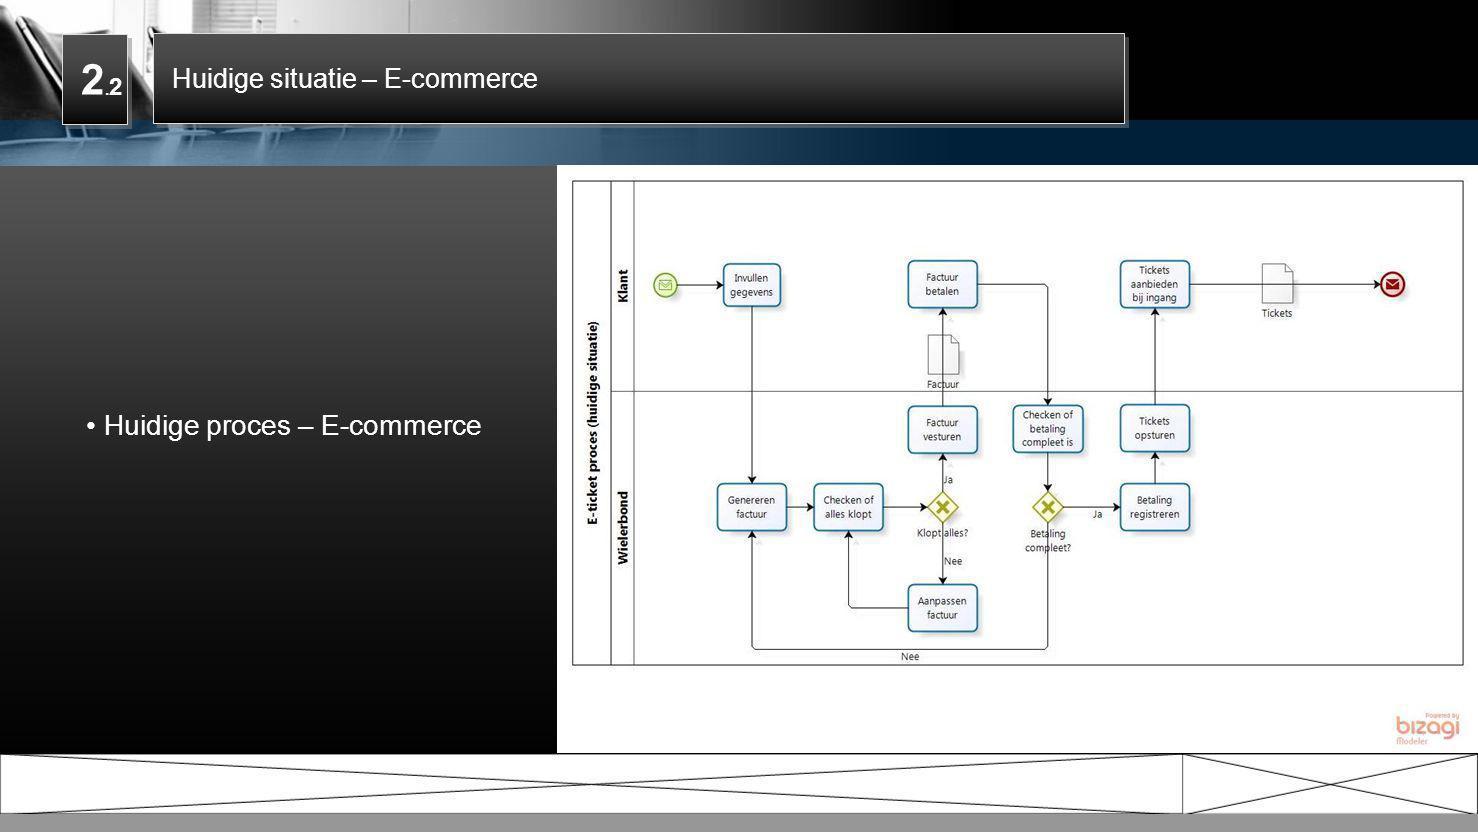 2.2 Huidige situatie – E-commerce Huidige proces – E-commerce 5